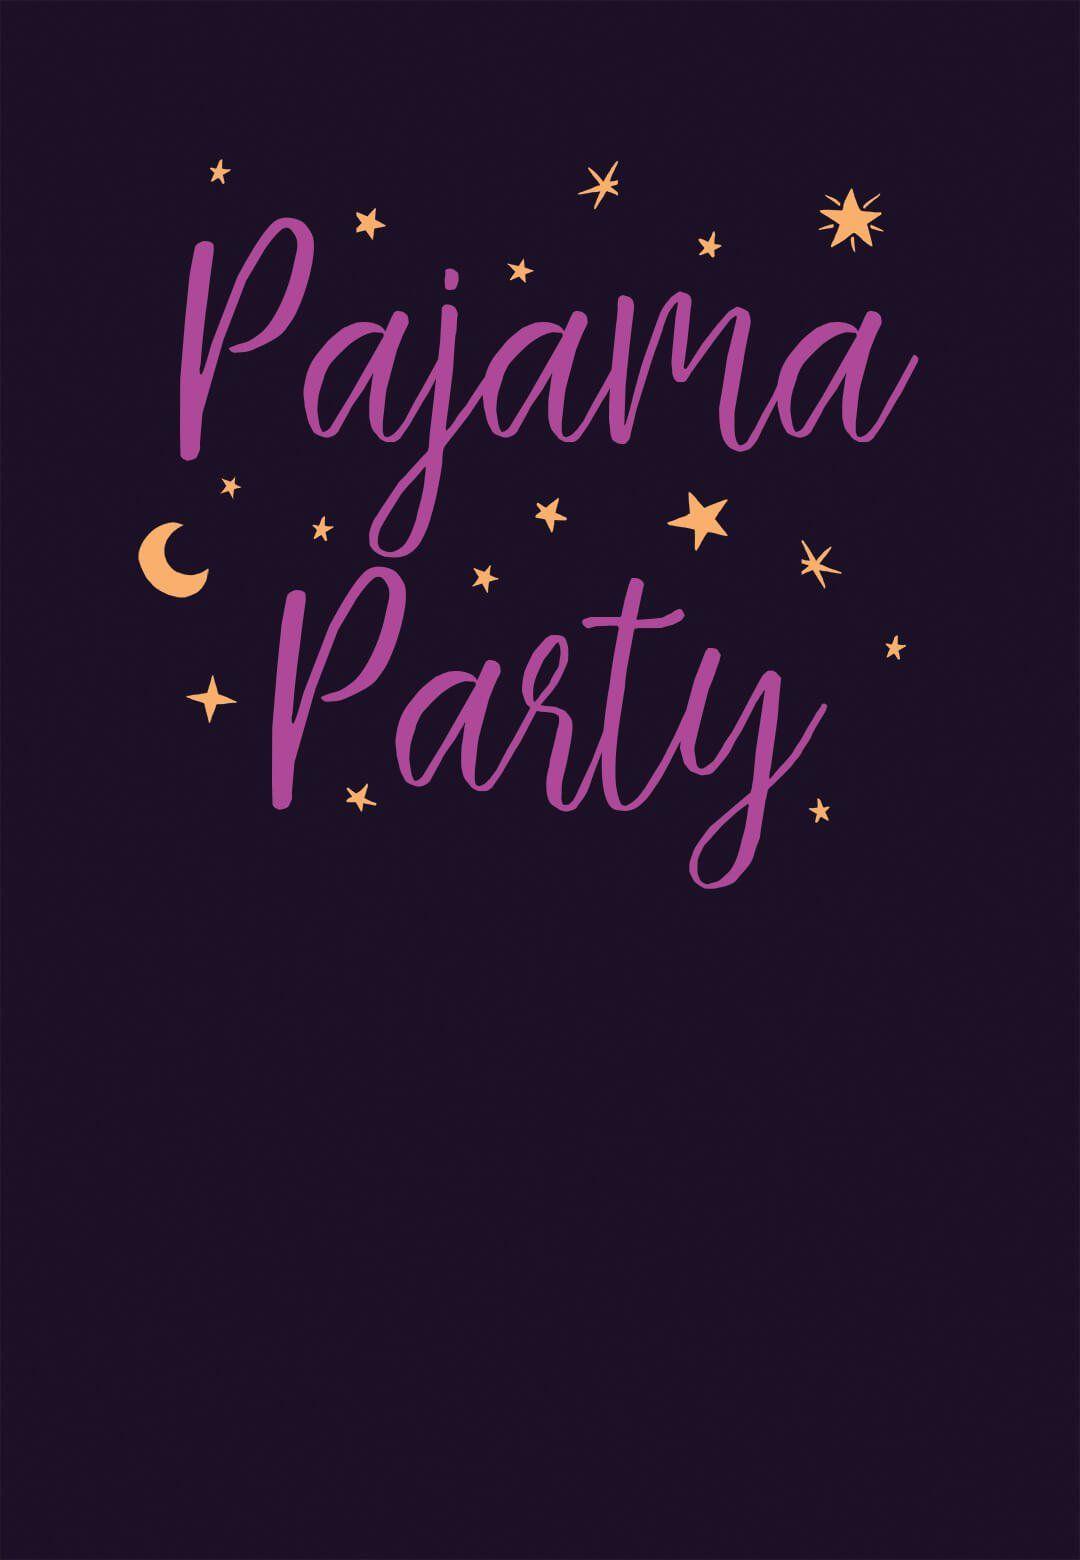 Pajama Party - Free Printable Sleepover Party Invitation Template ...